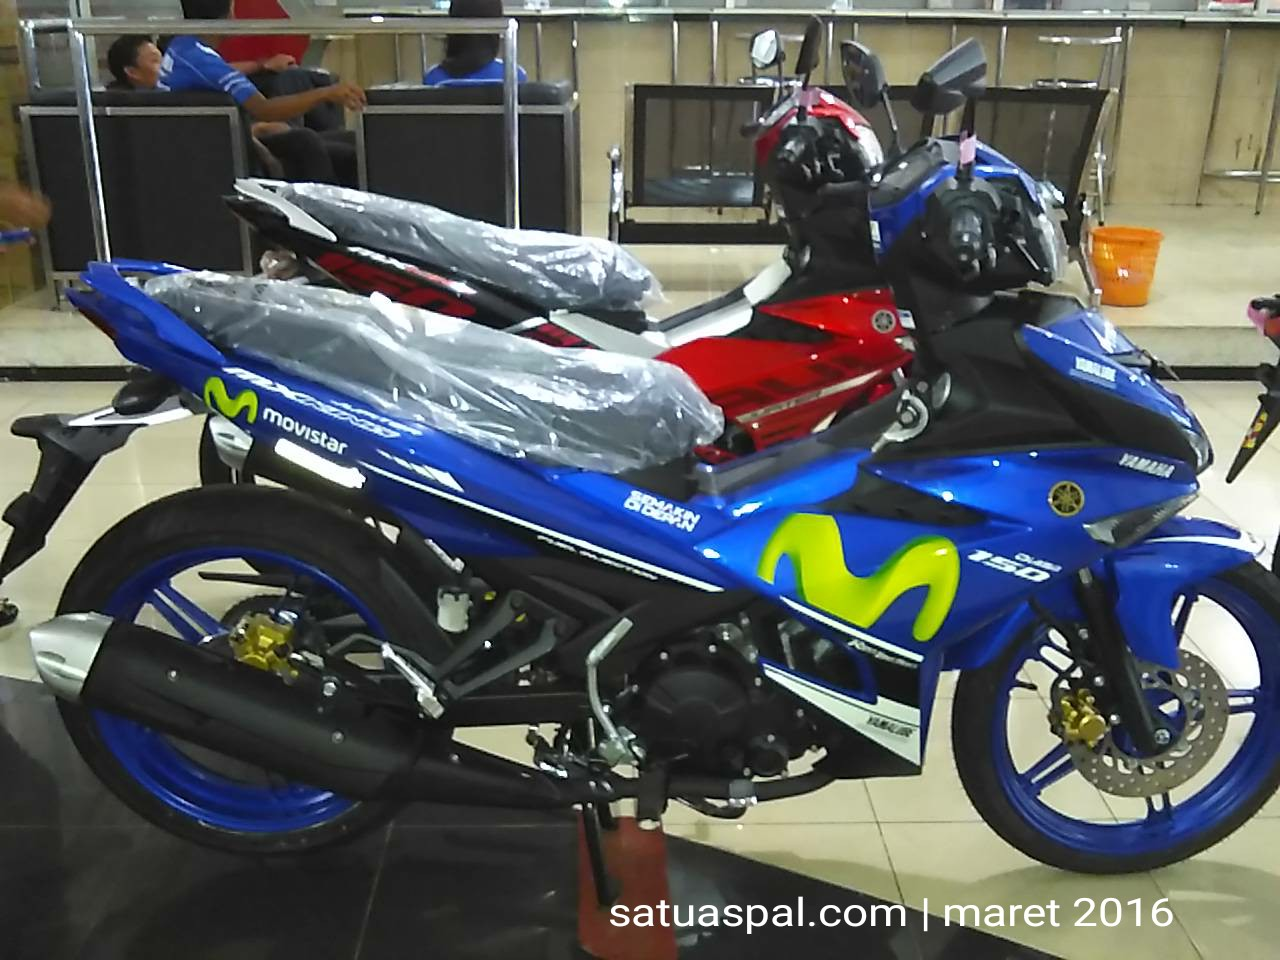 Harga MX King 150 MX King 150 Motogp Dan Jupiter MX 150